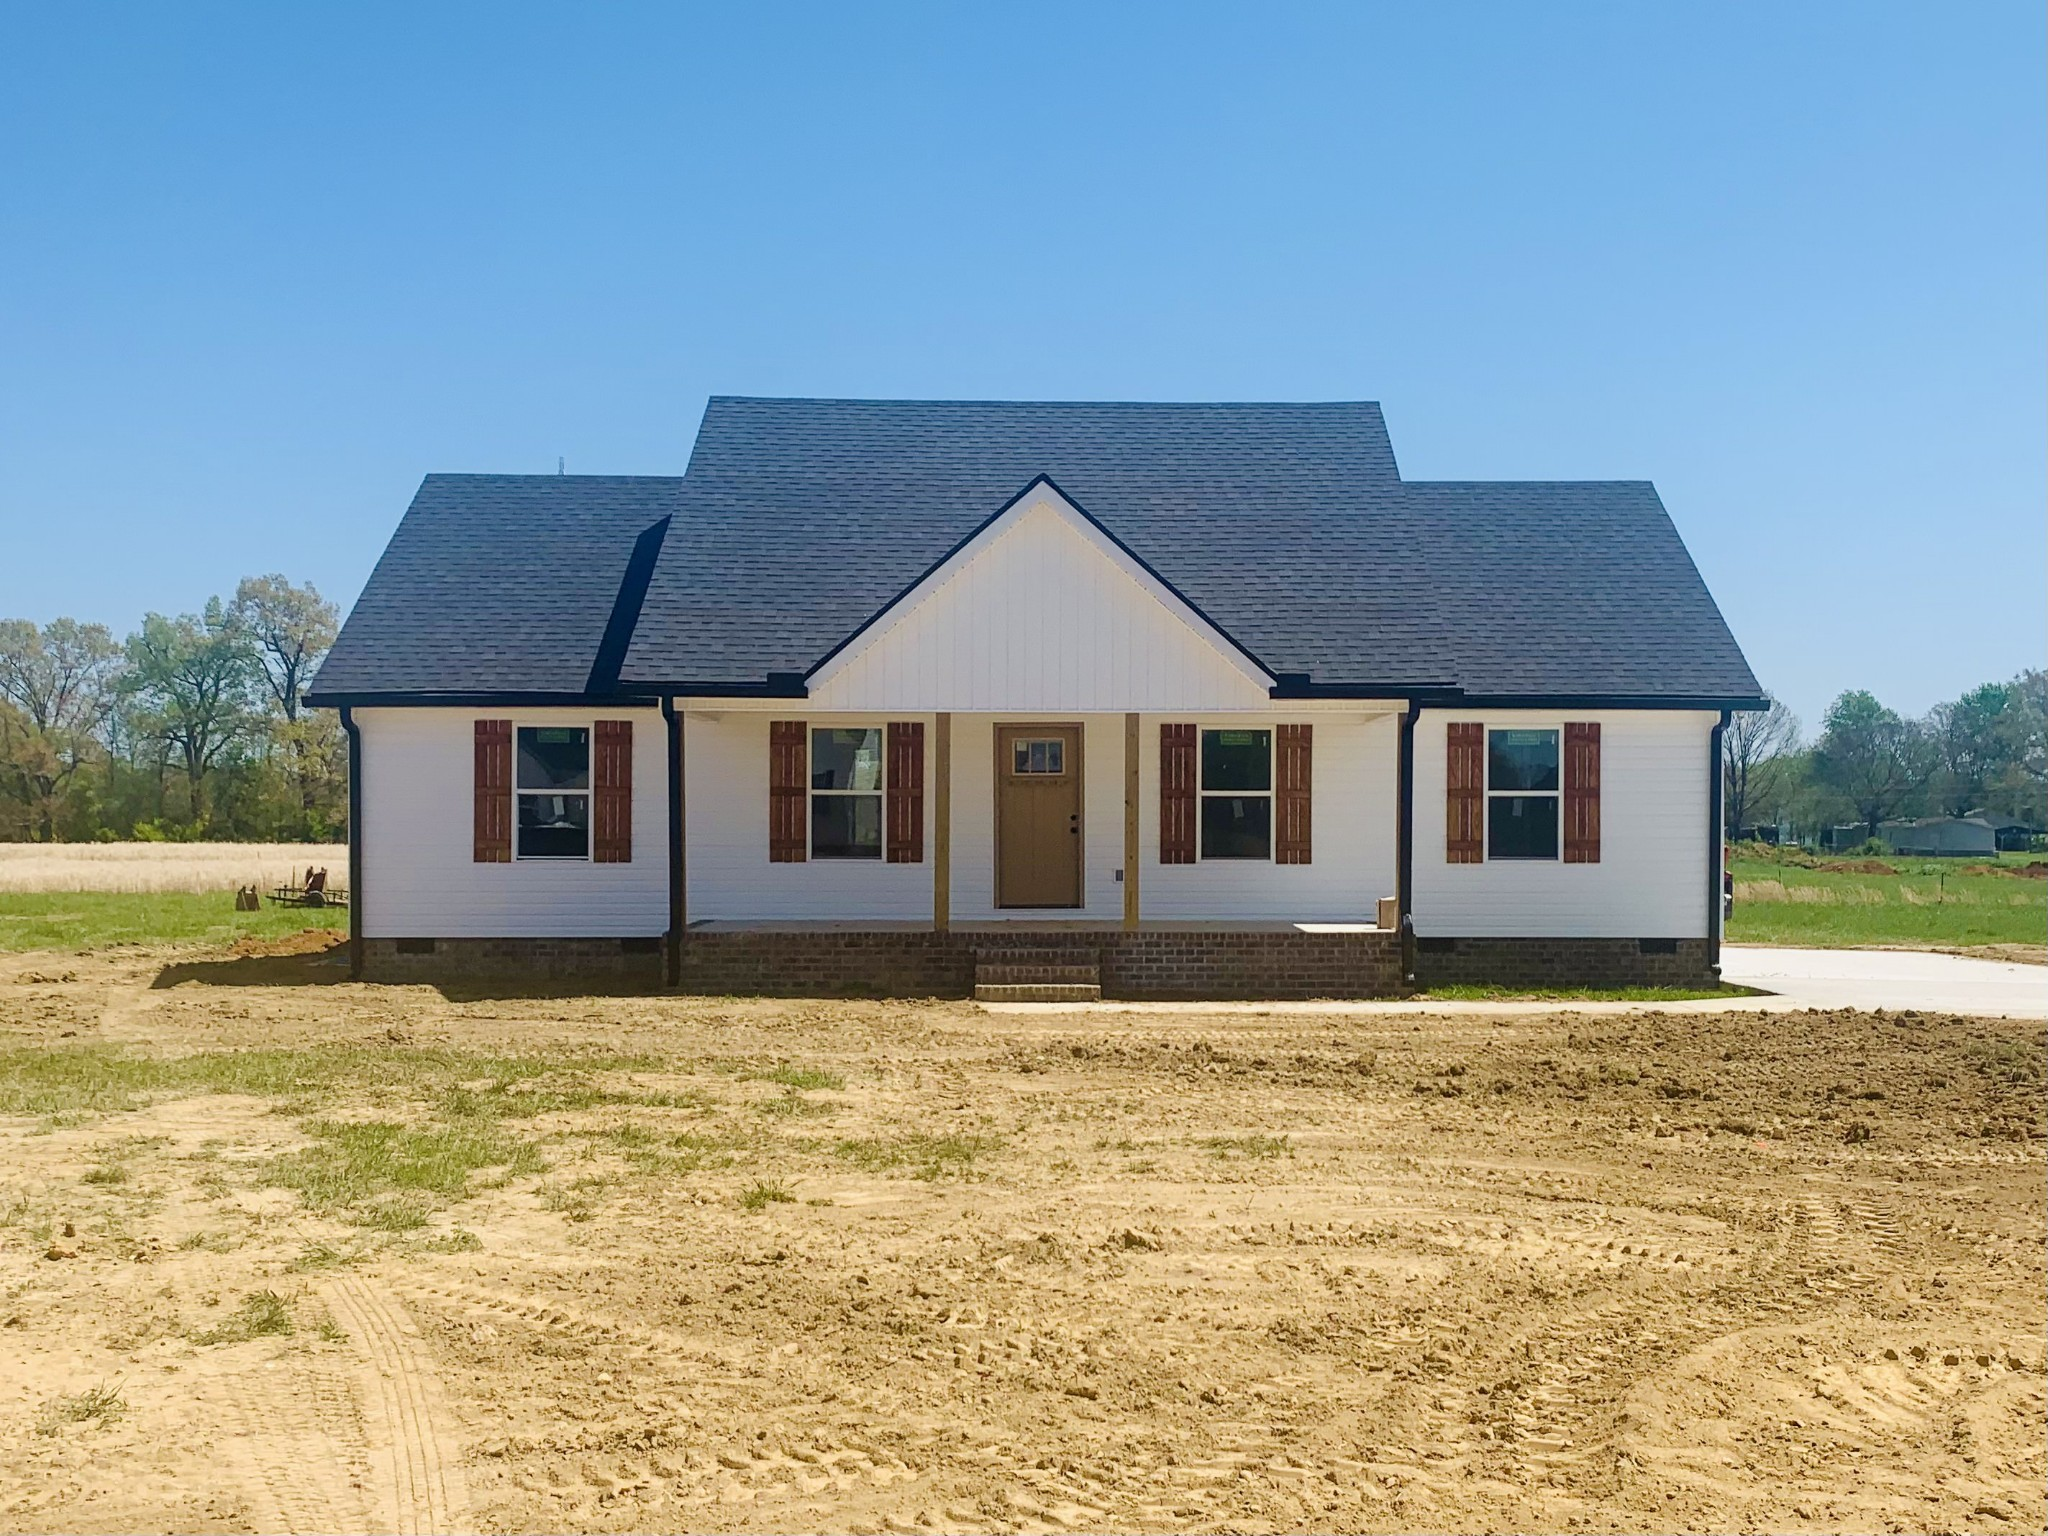 62 Carson Ln Property Photo - Ethridge, TN real estate listing